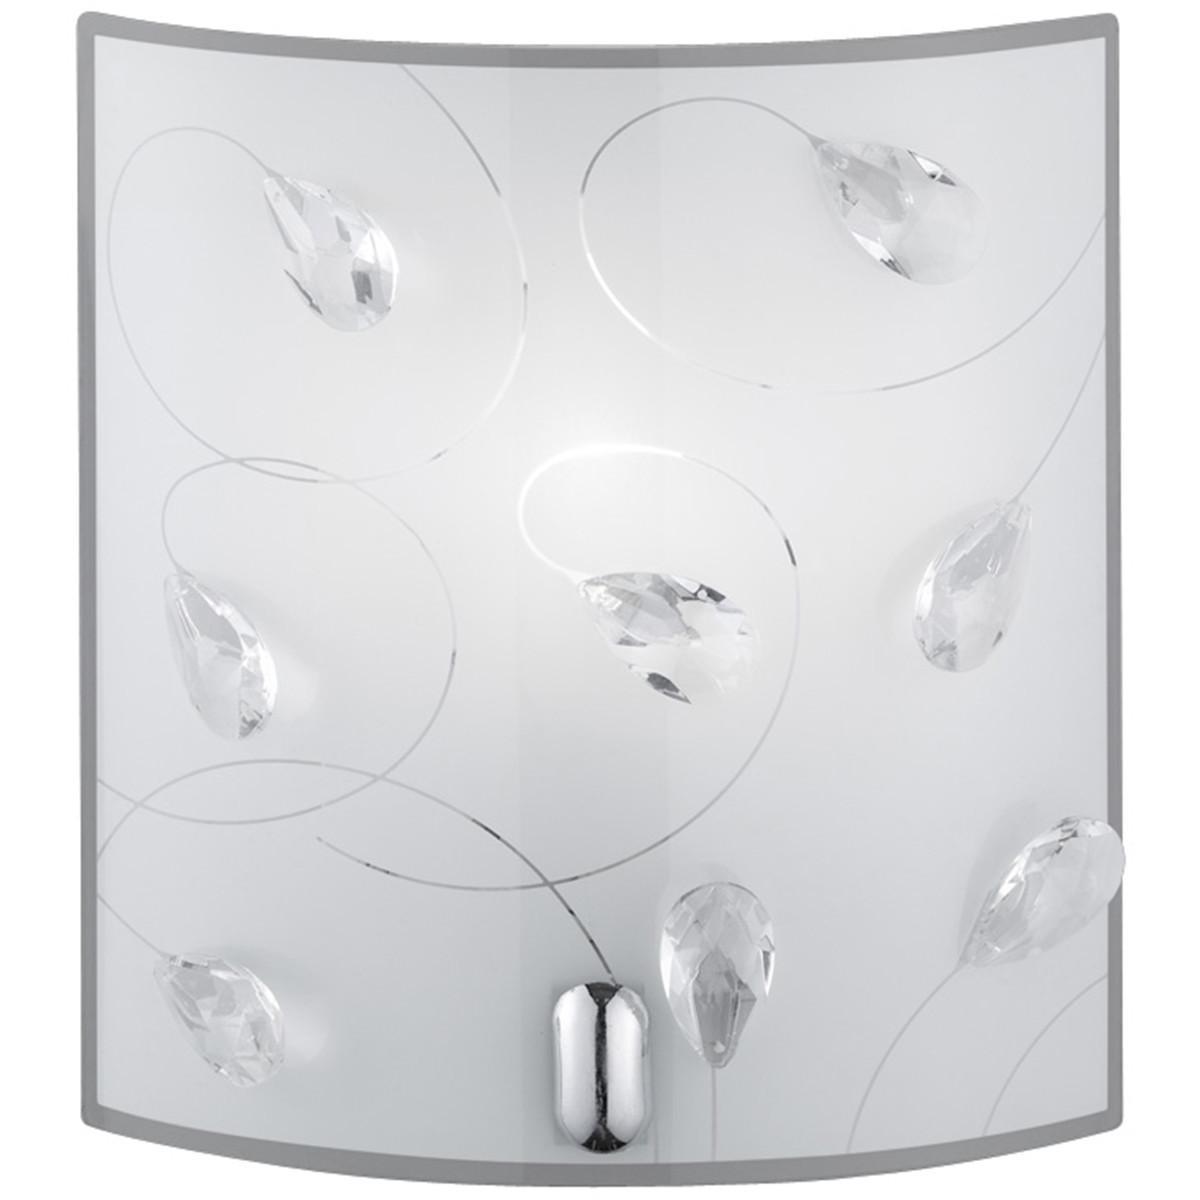 LED Wandlamp - Wandverlichting - Trion Corado - E14 Fitting - Rechthoek - Mat Chroom - Aluminium